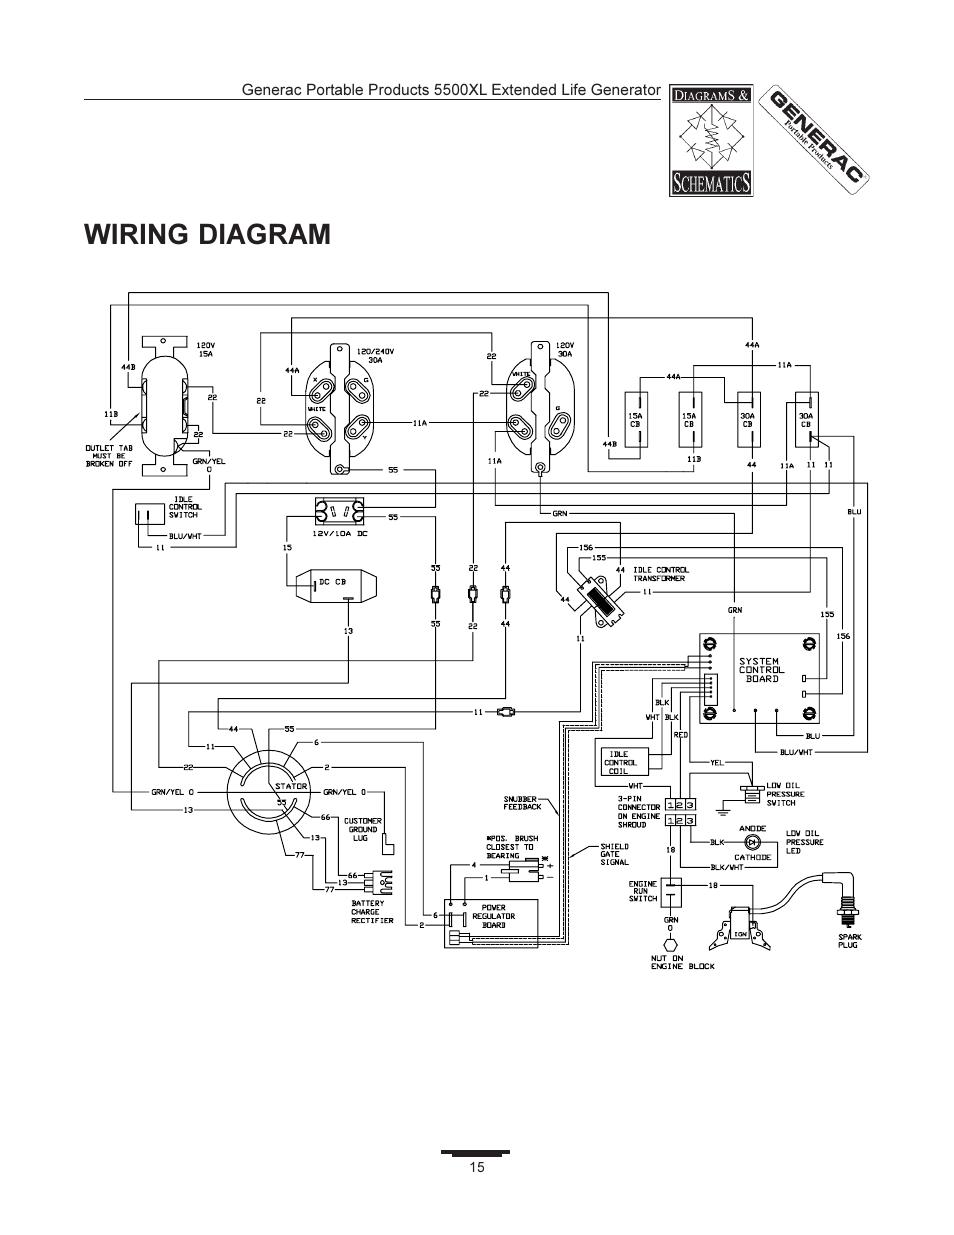 medium resolution of wiring diagram generac 5500xl user manual page 15 18 generac generator wiring schematics generac 005735 wiring manuals